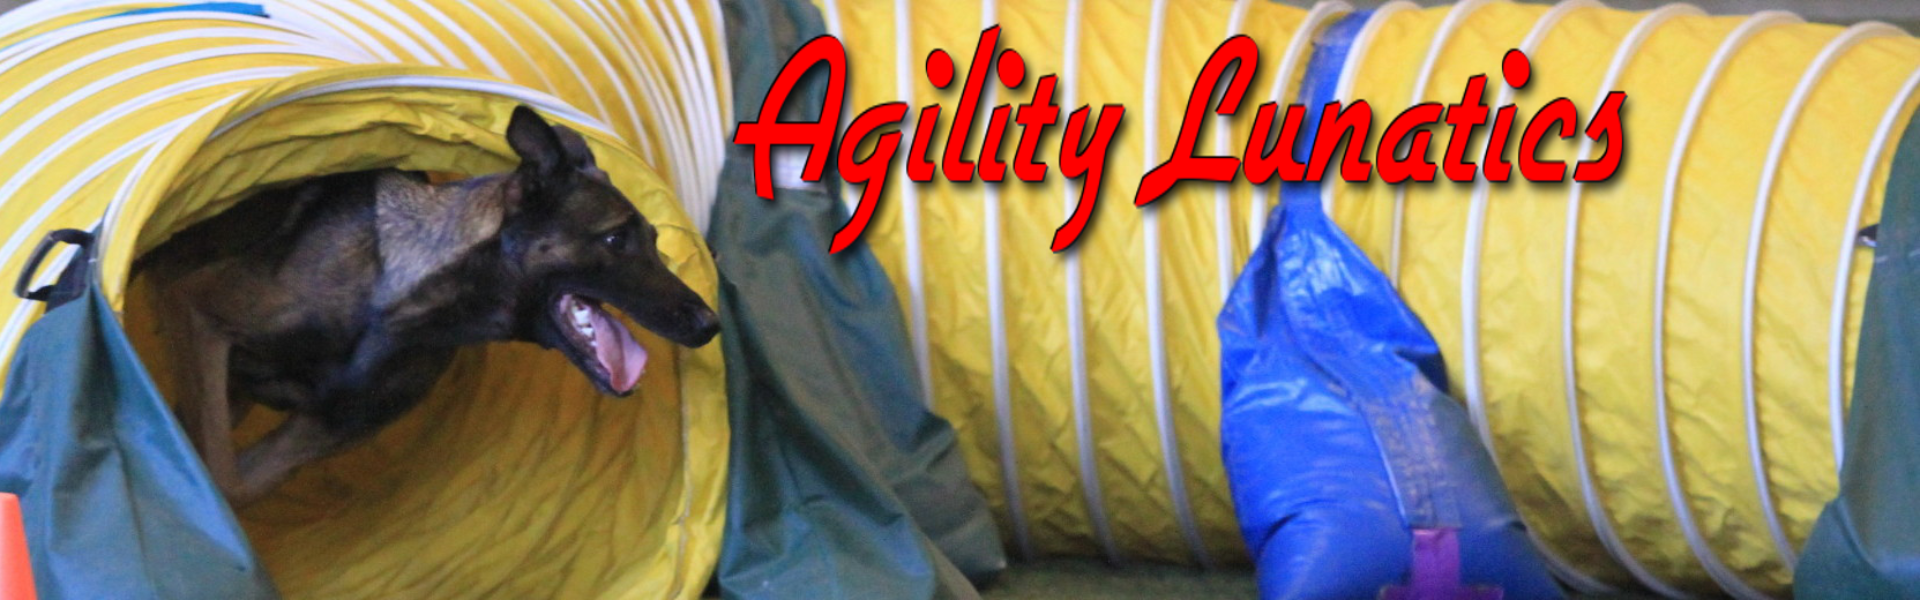 Agility Lunatics